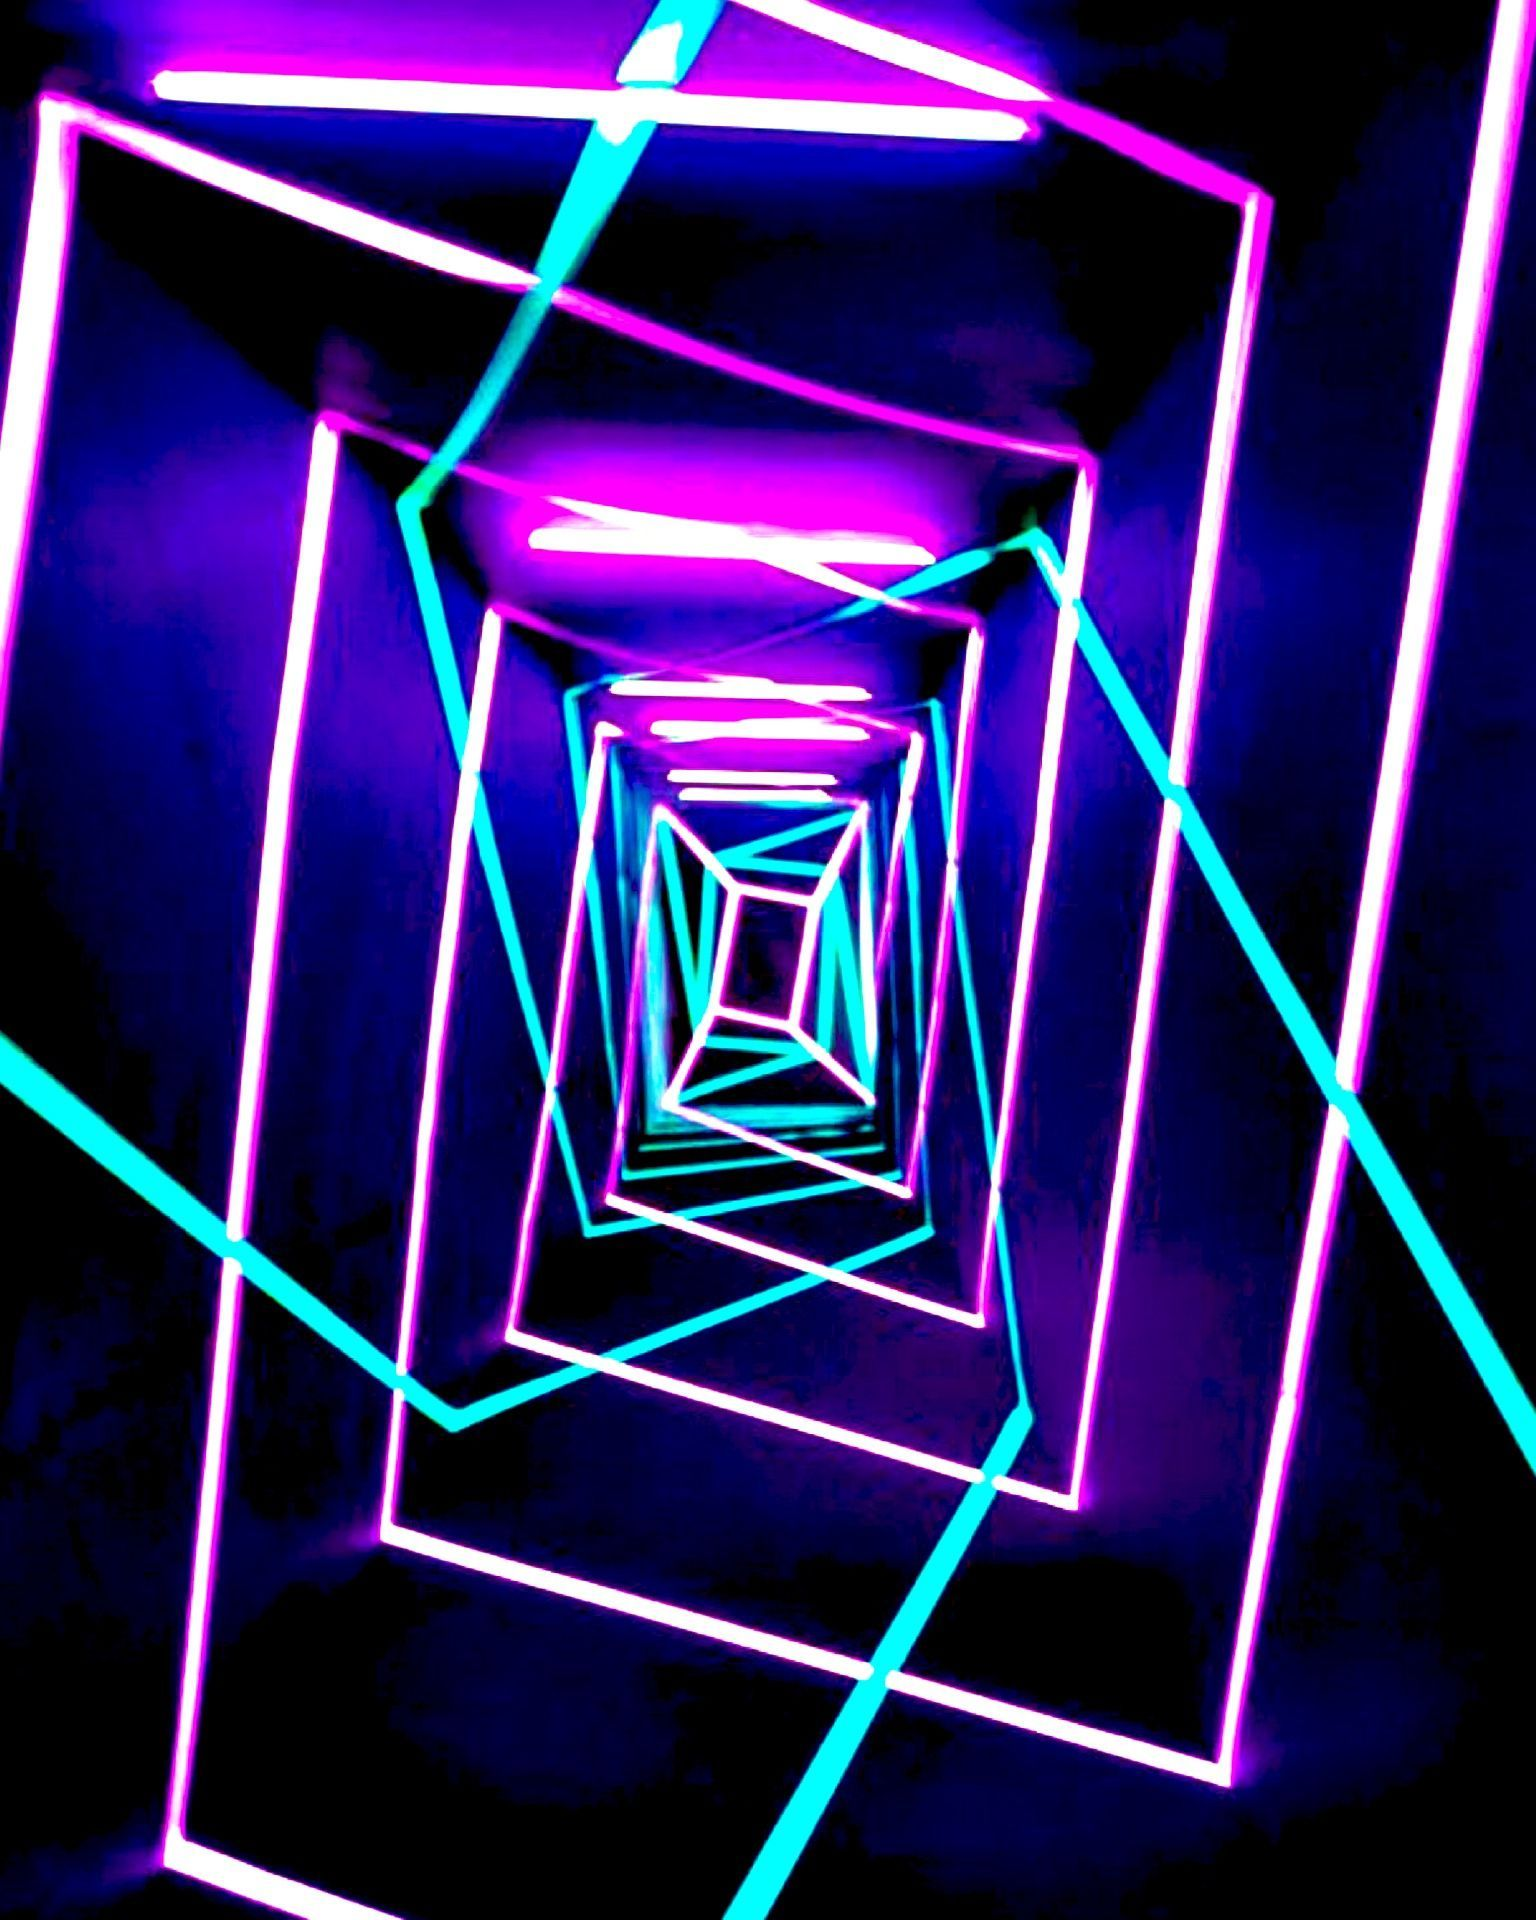 Neon Tunnel Neon Wallpaper Neon Backgrounds Neon